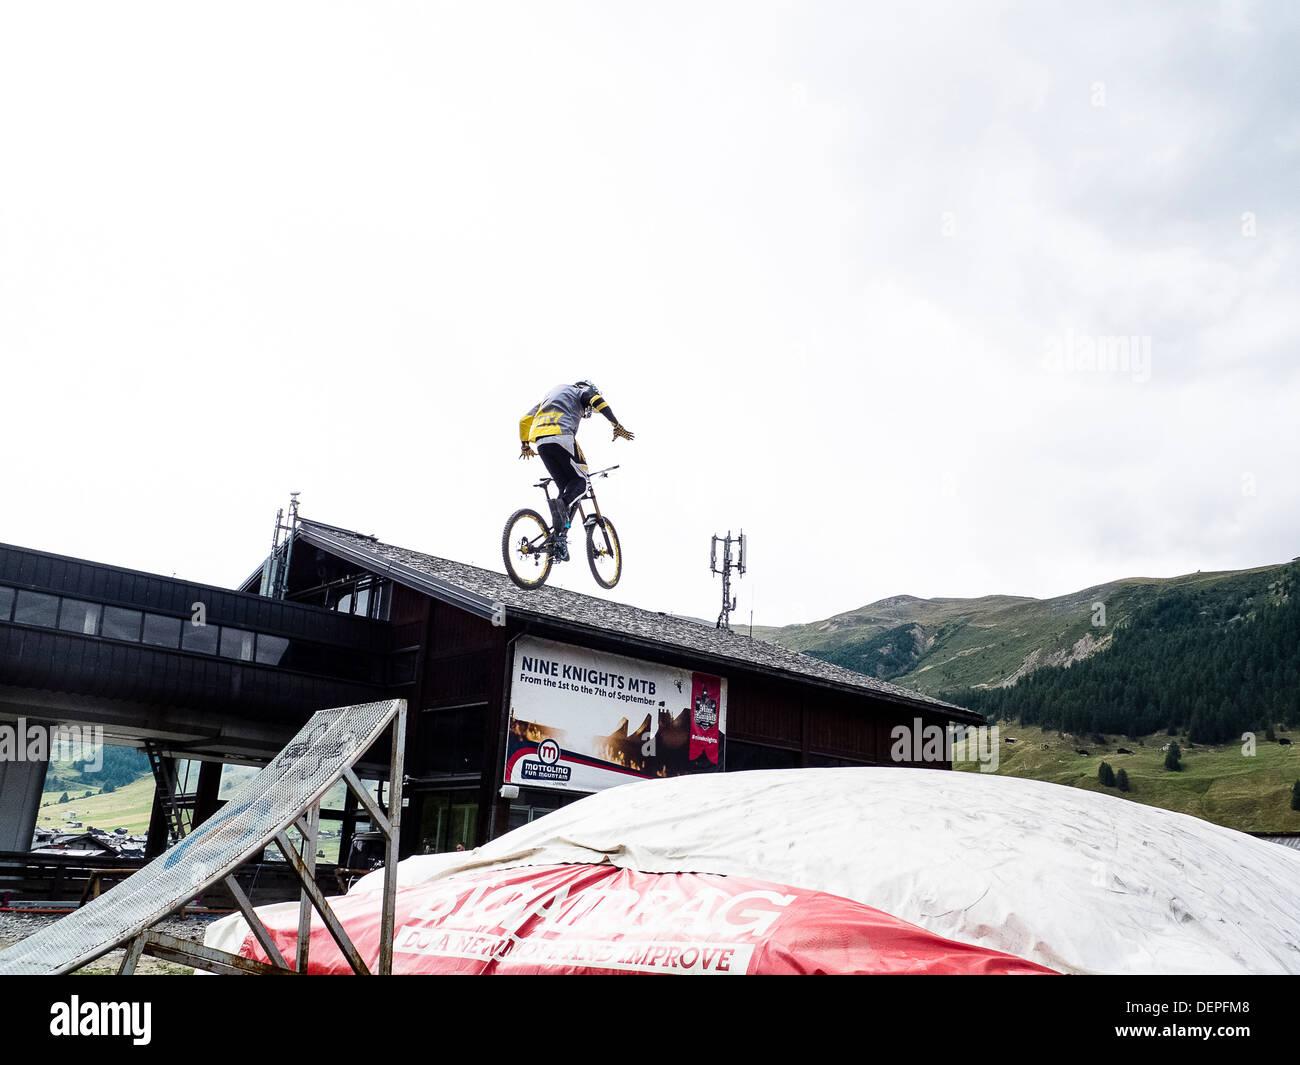 jump on a bike - Stock Image